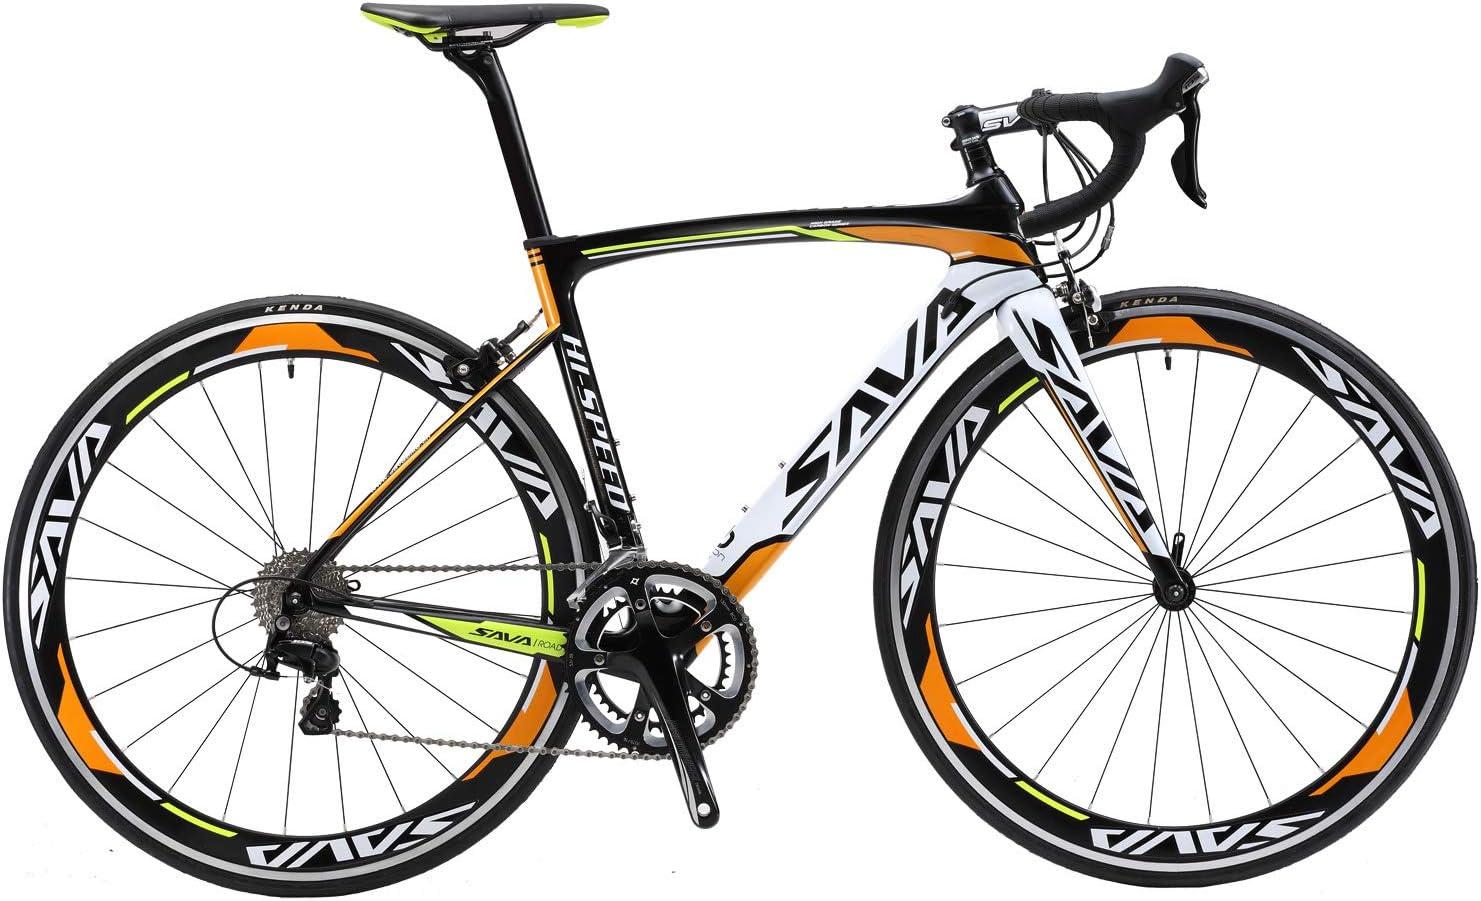 RWA Sportswear - Savadeck Carbon Fiber Racing Road Bike